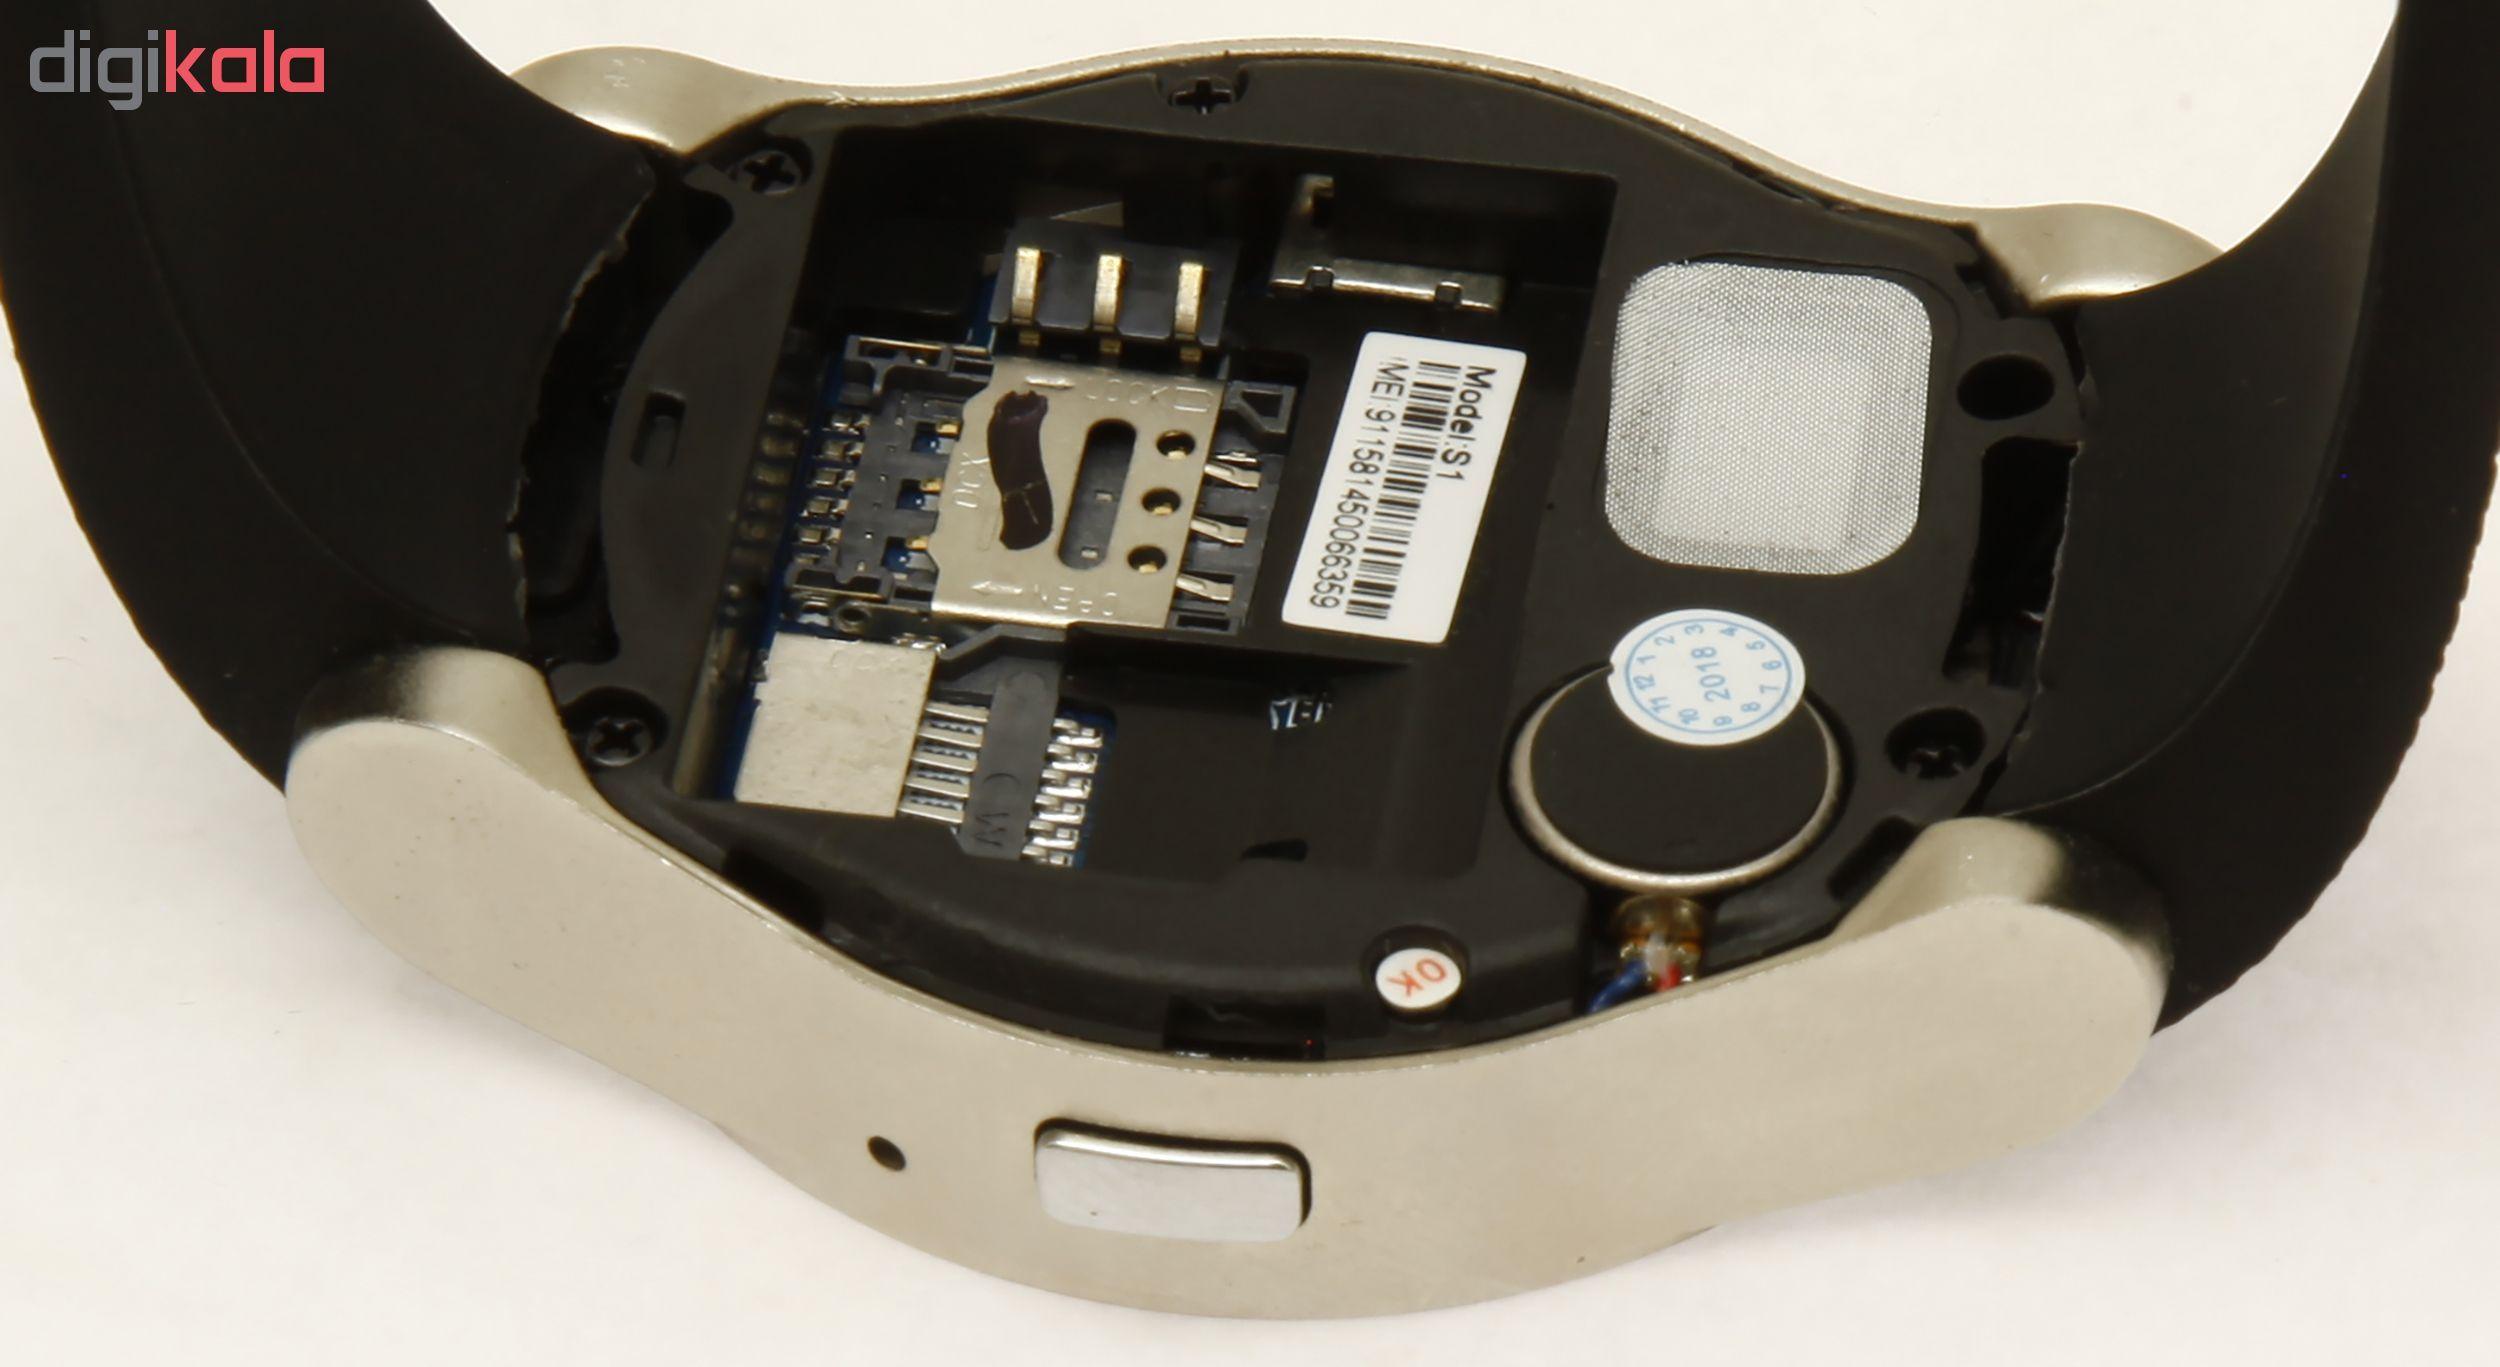 ساعت هوشمند جی تب مدل S1 main 1 7